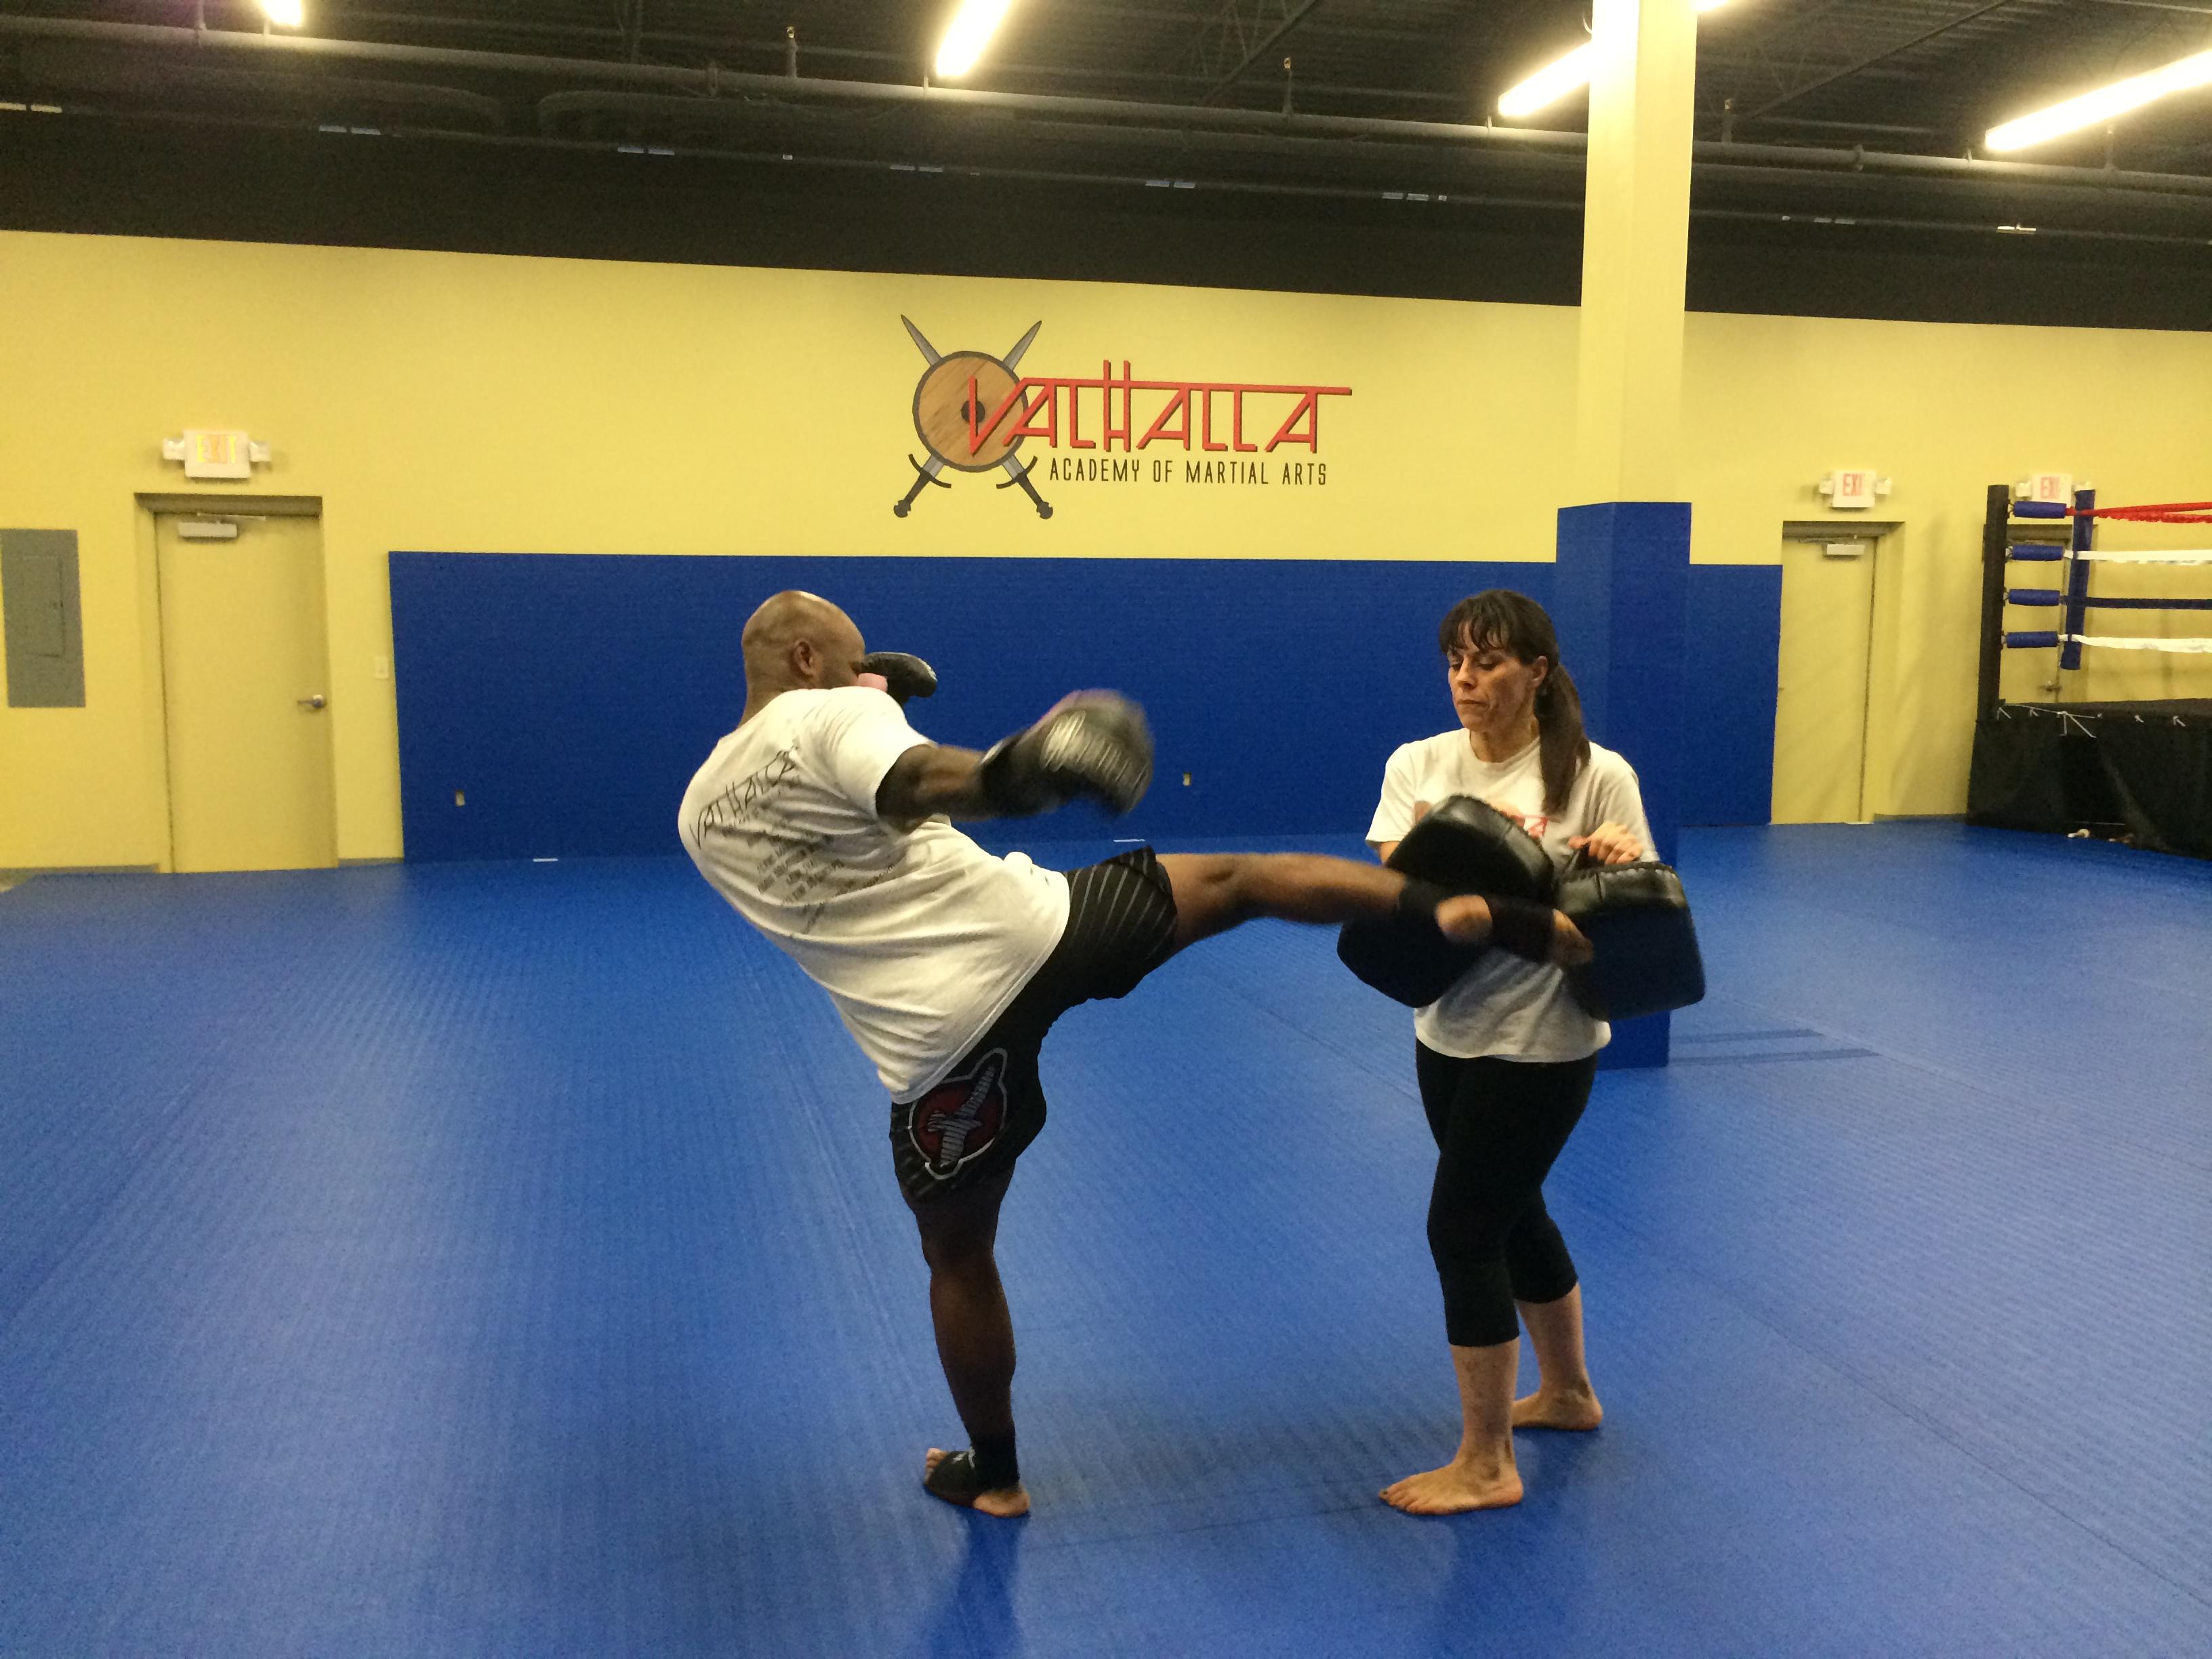 Valhalla Academy of Martial Arts image 3